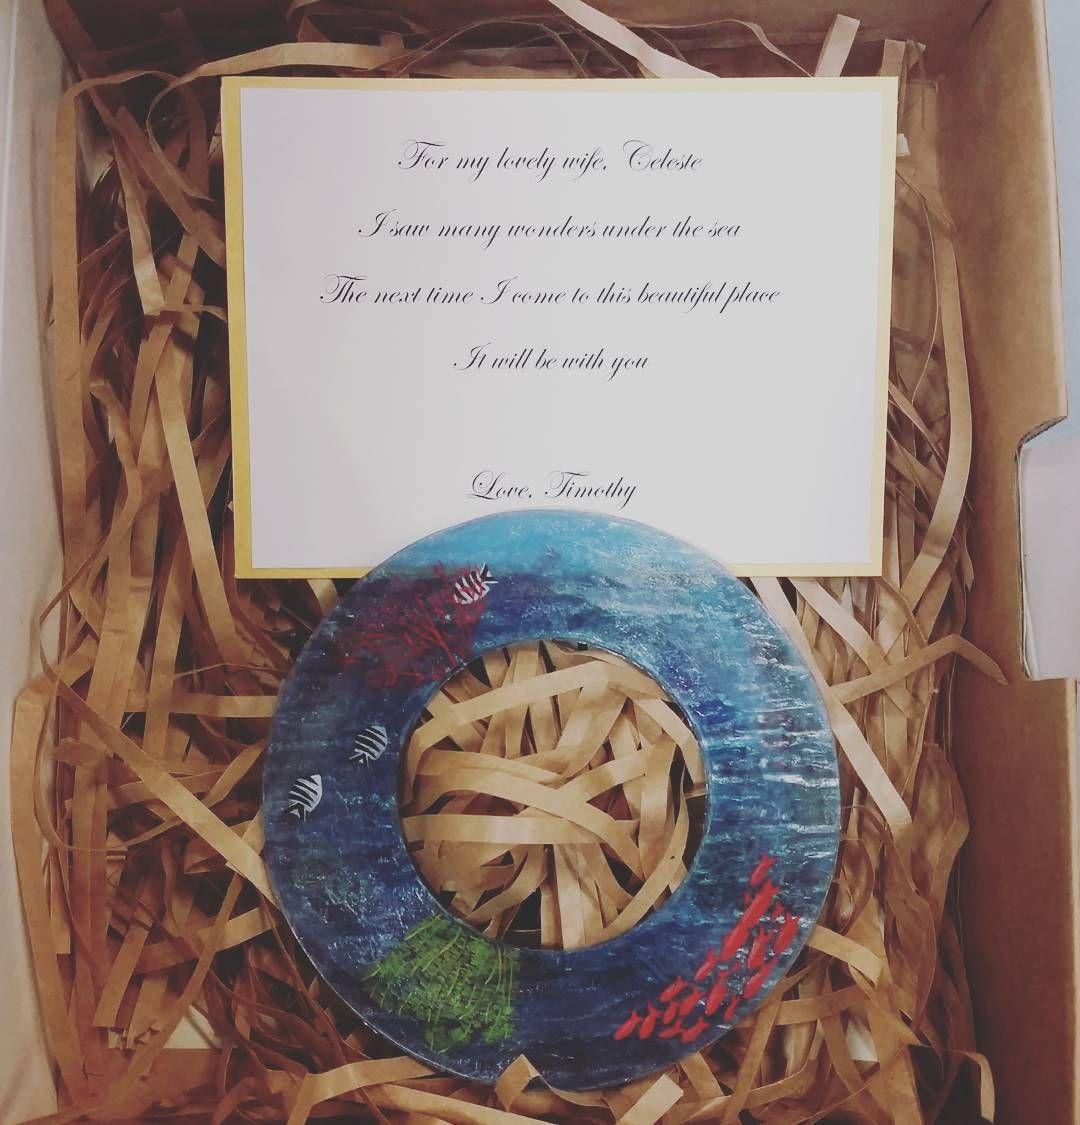 Souvenir project for jewellery design class. #jewelry #bracelet #greatbarrierreef #marine #gift #souvenir #scubadiver #underwater by lillianlilz09 http://ift.tt/1UokkV2